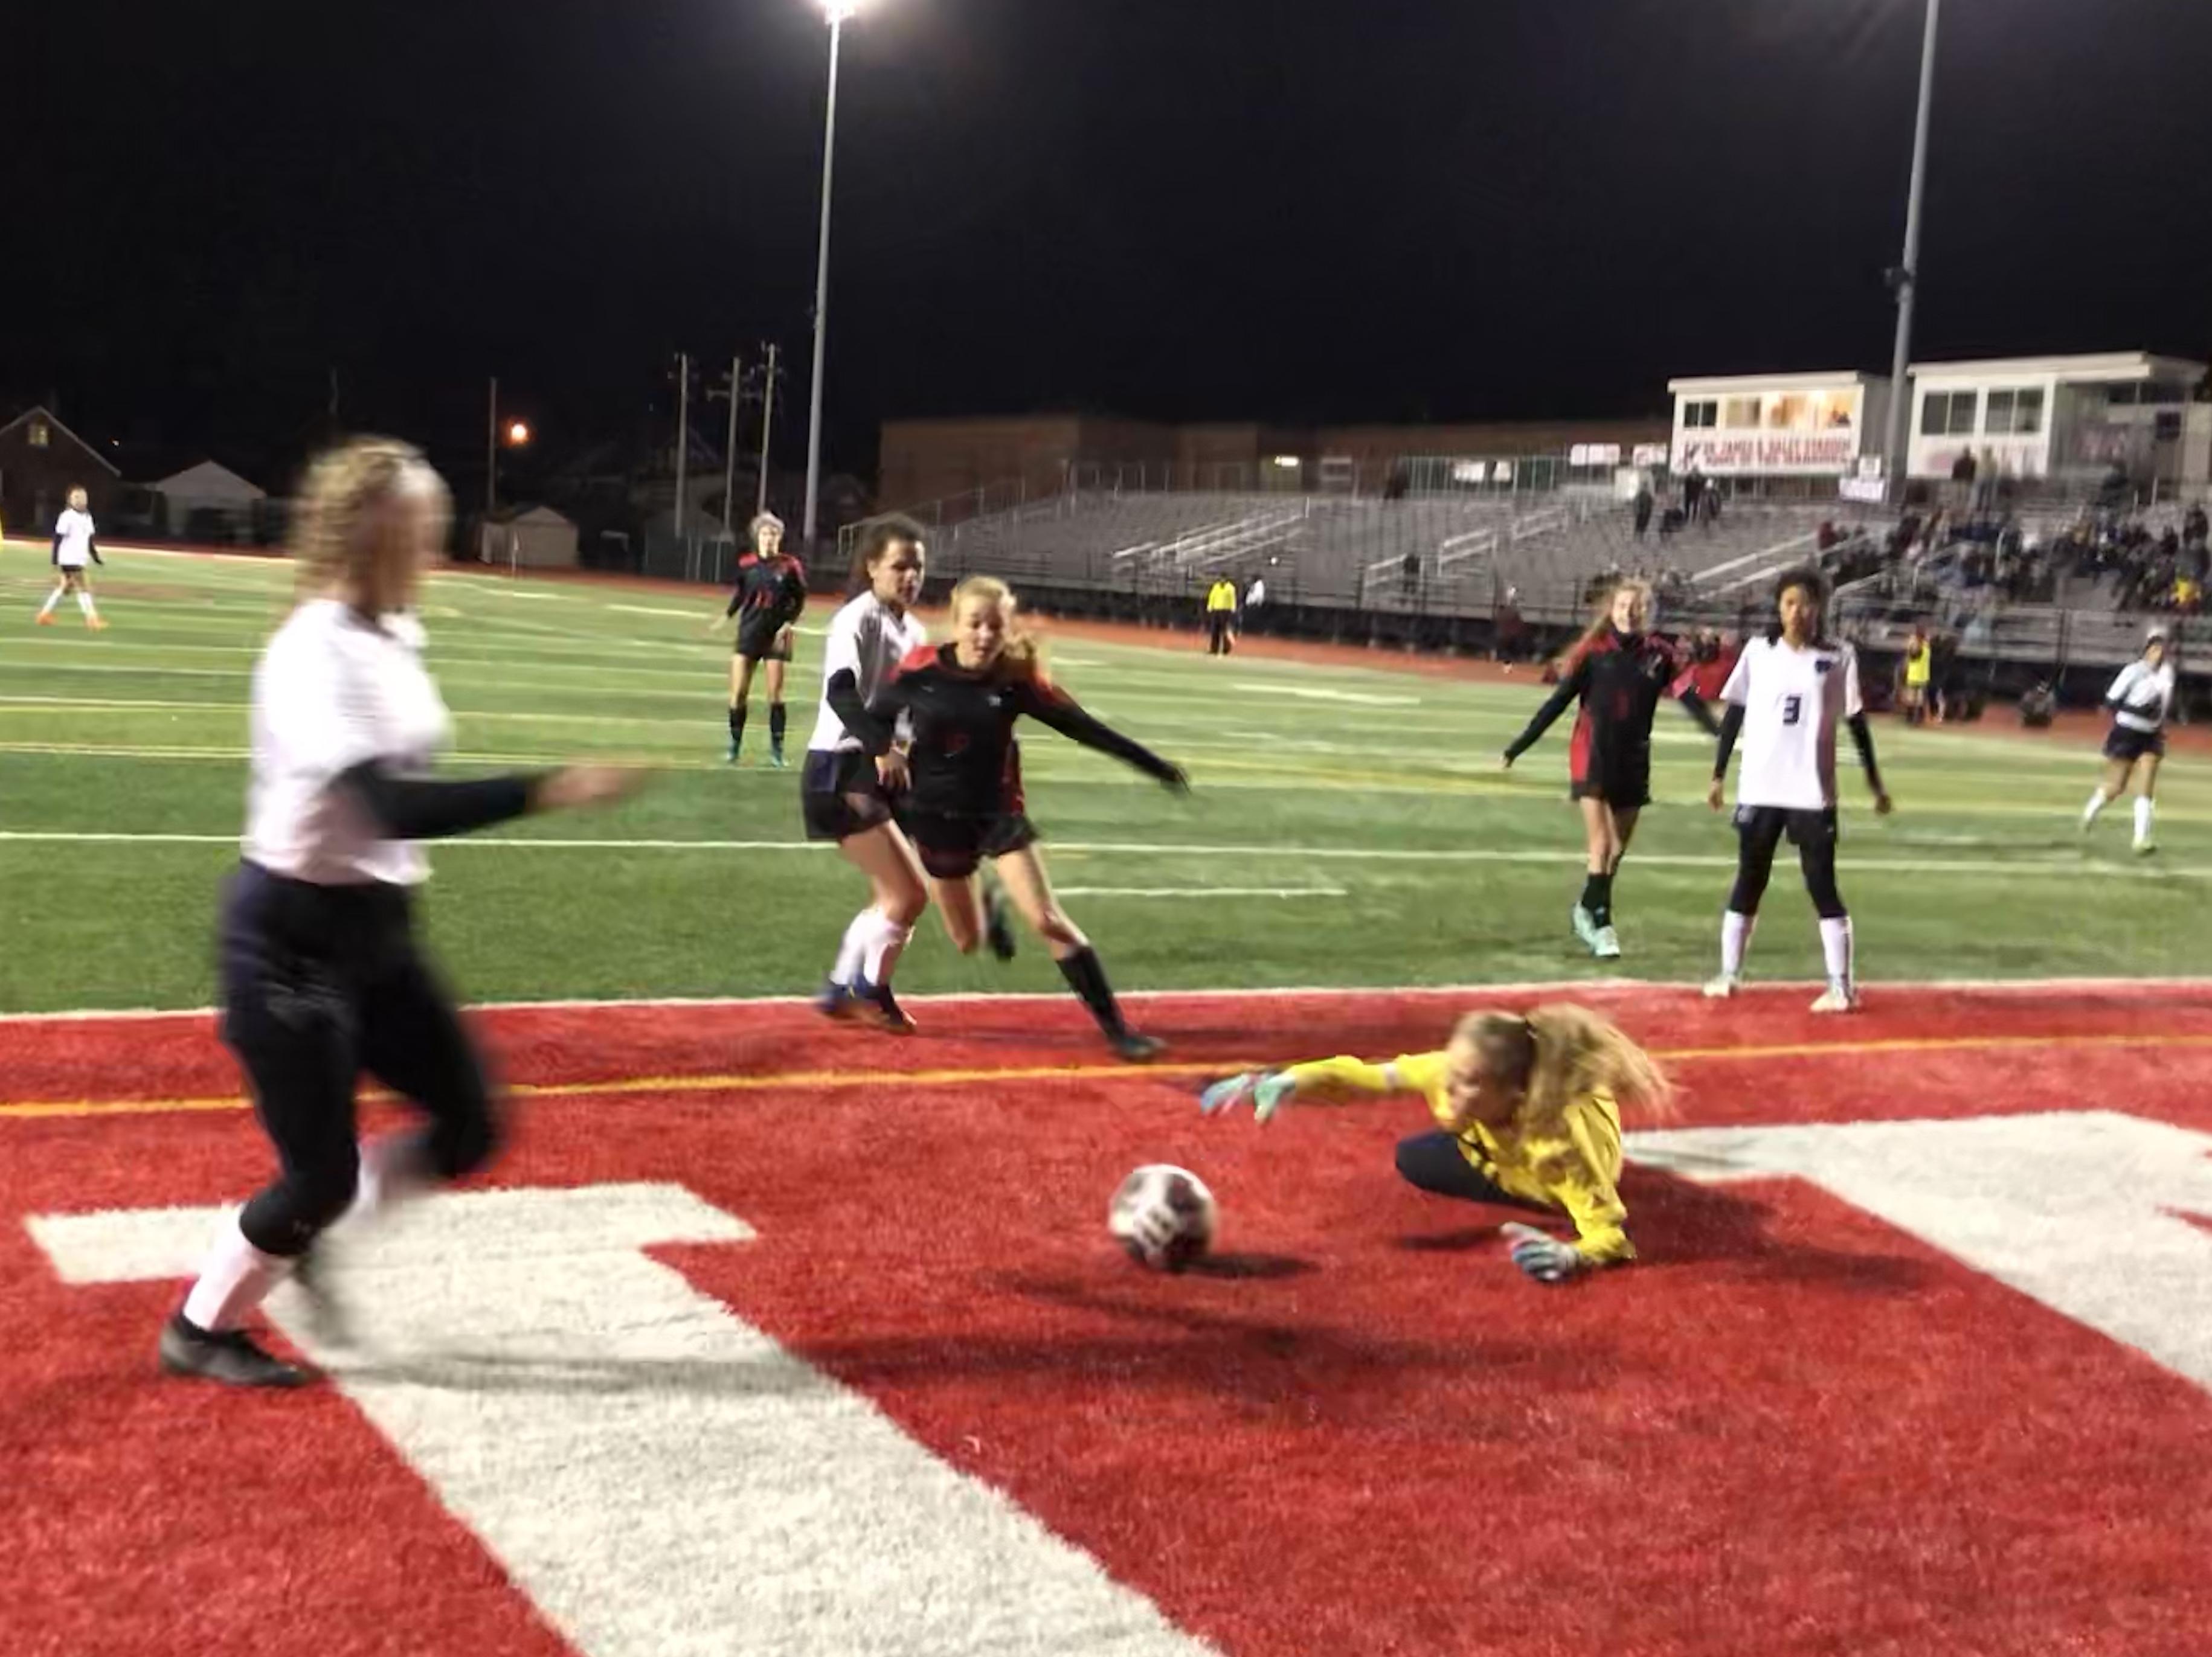 Danburg: Girls Varsity Soccer Advances With Playoff Win Versus Keystone, 5-0